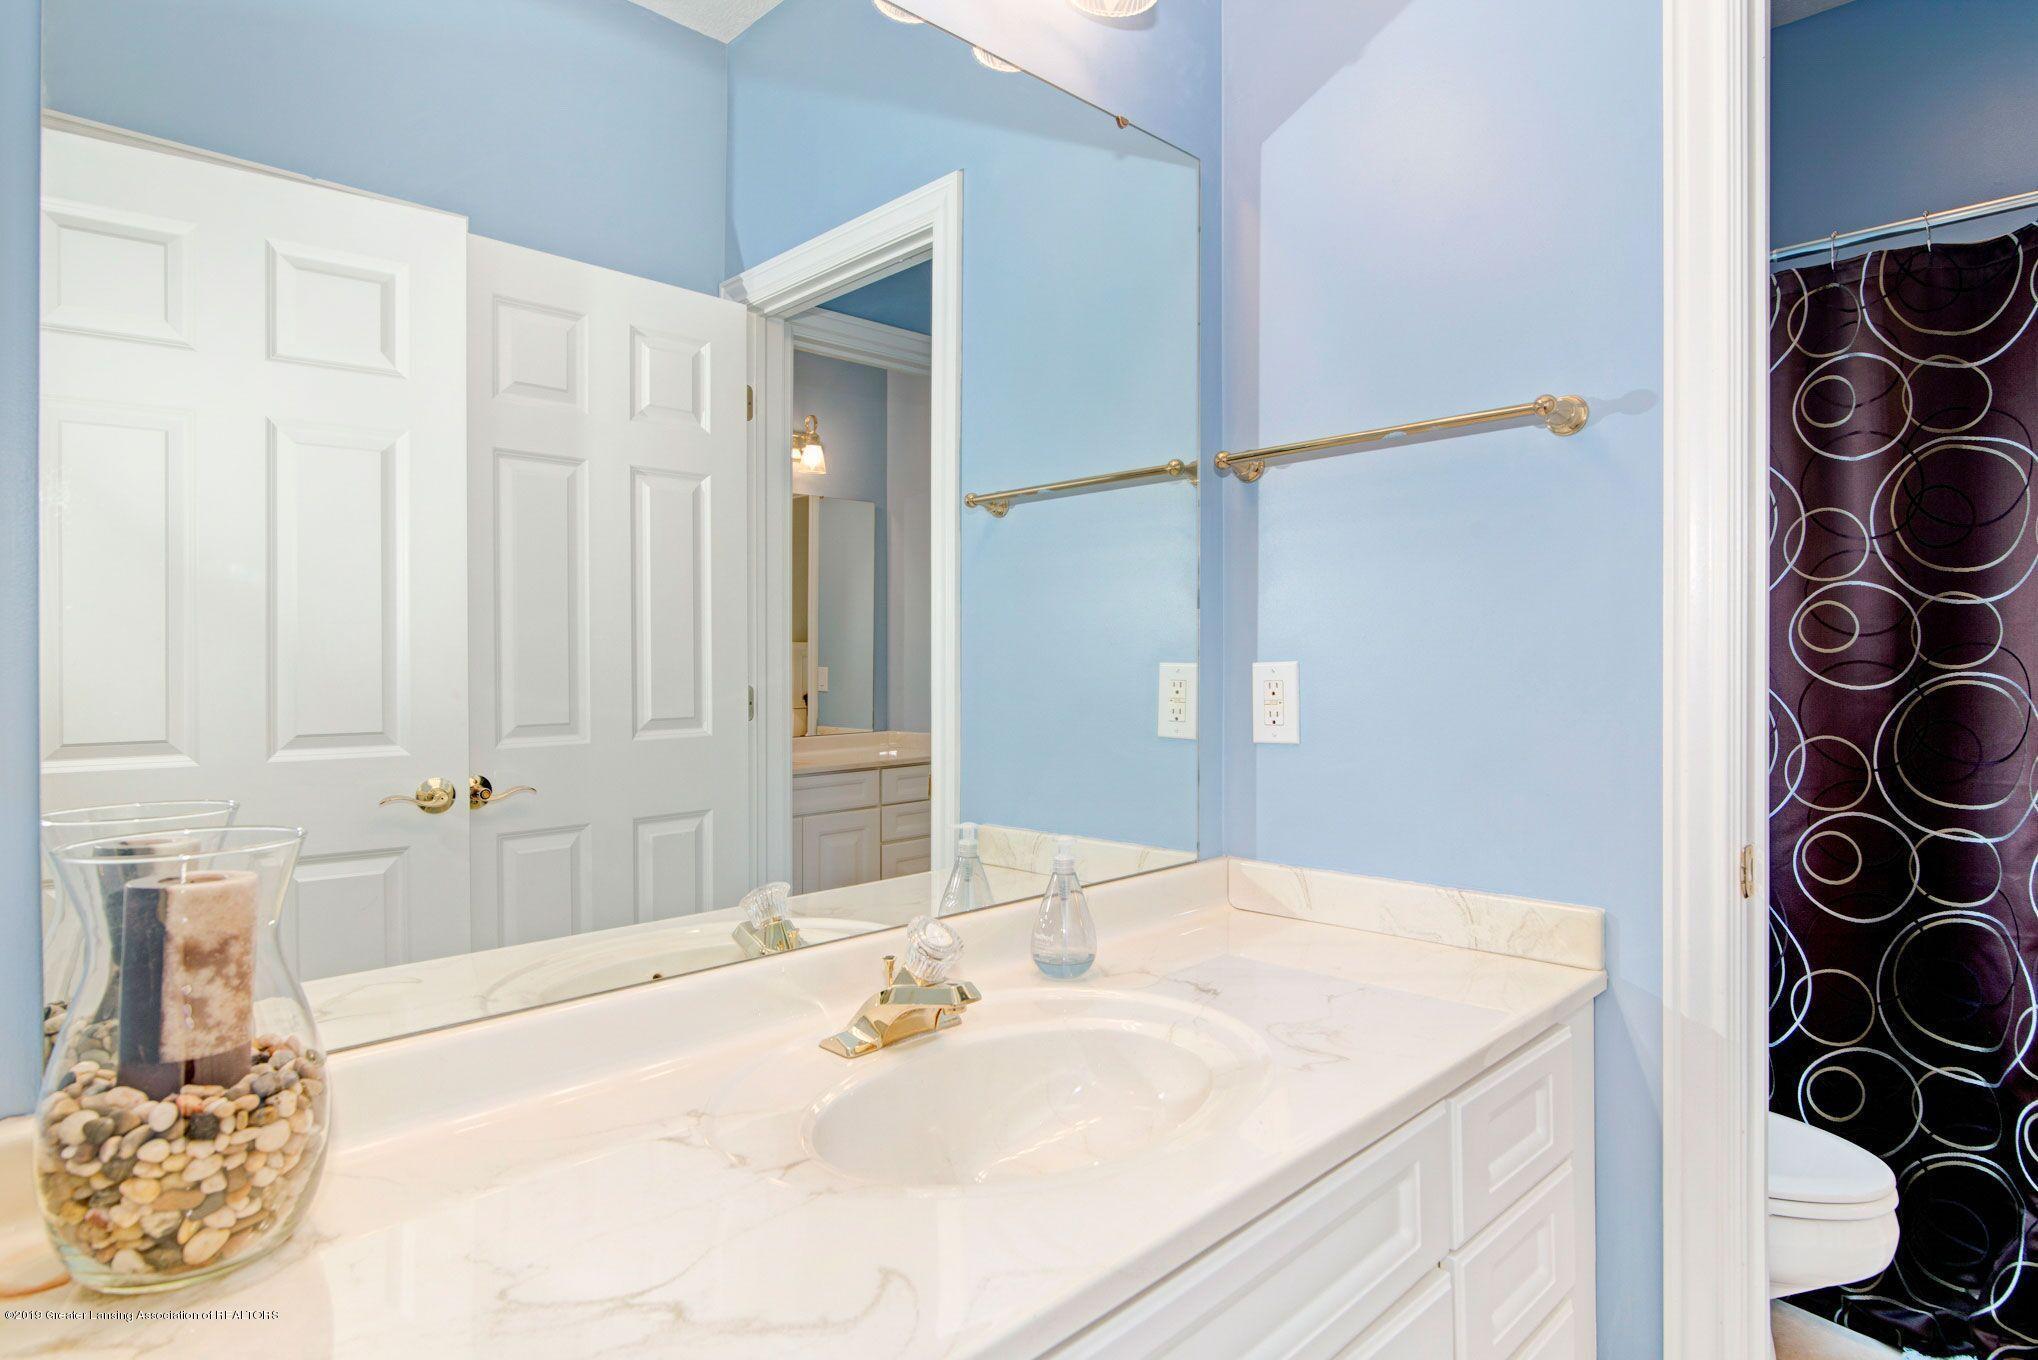 6389 Ridgepond Dr - Bathroom 2 2 - 34